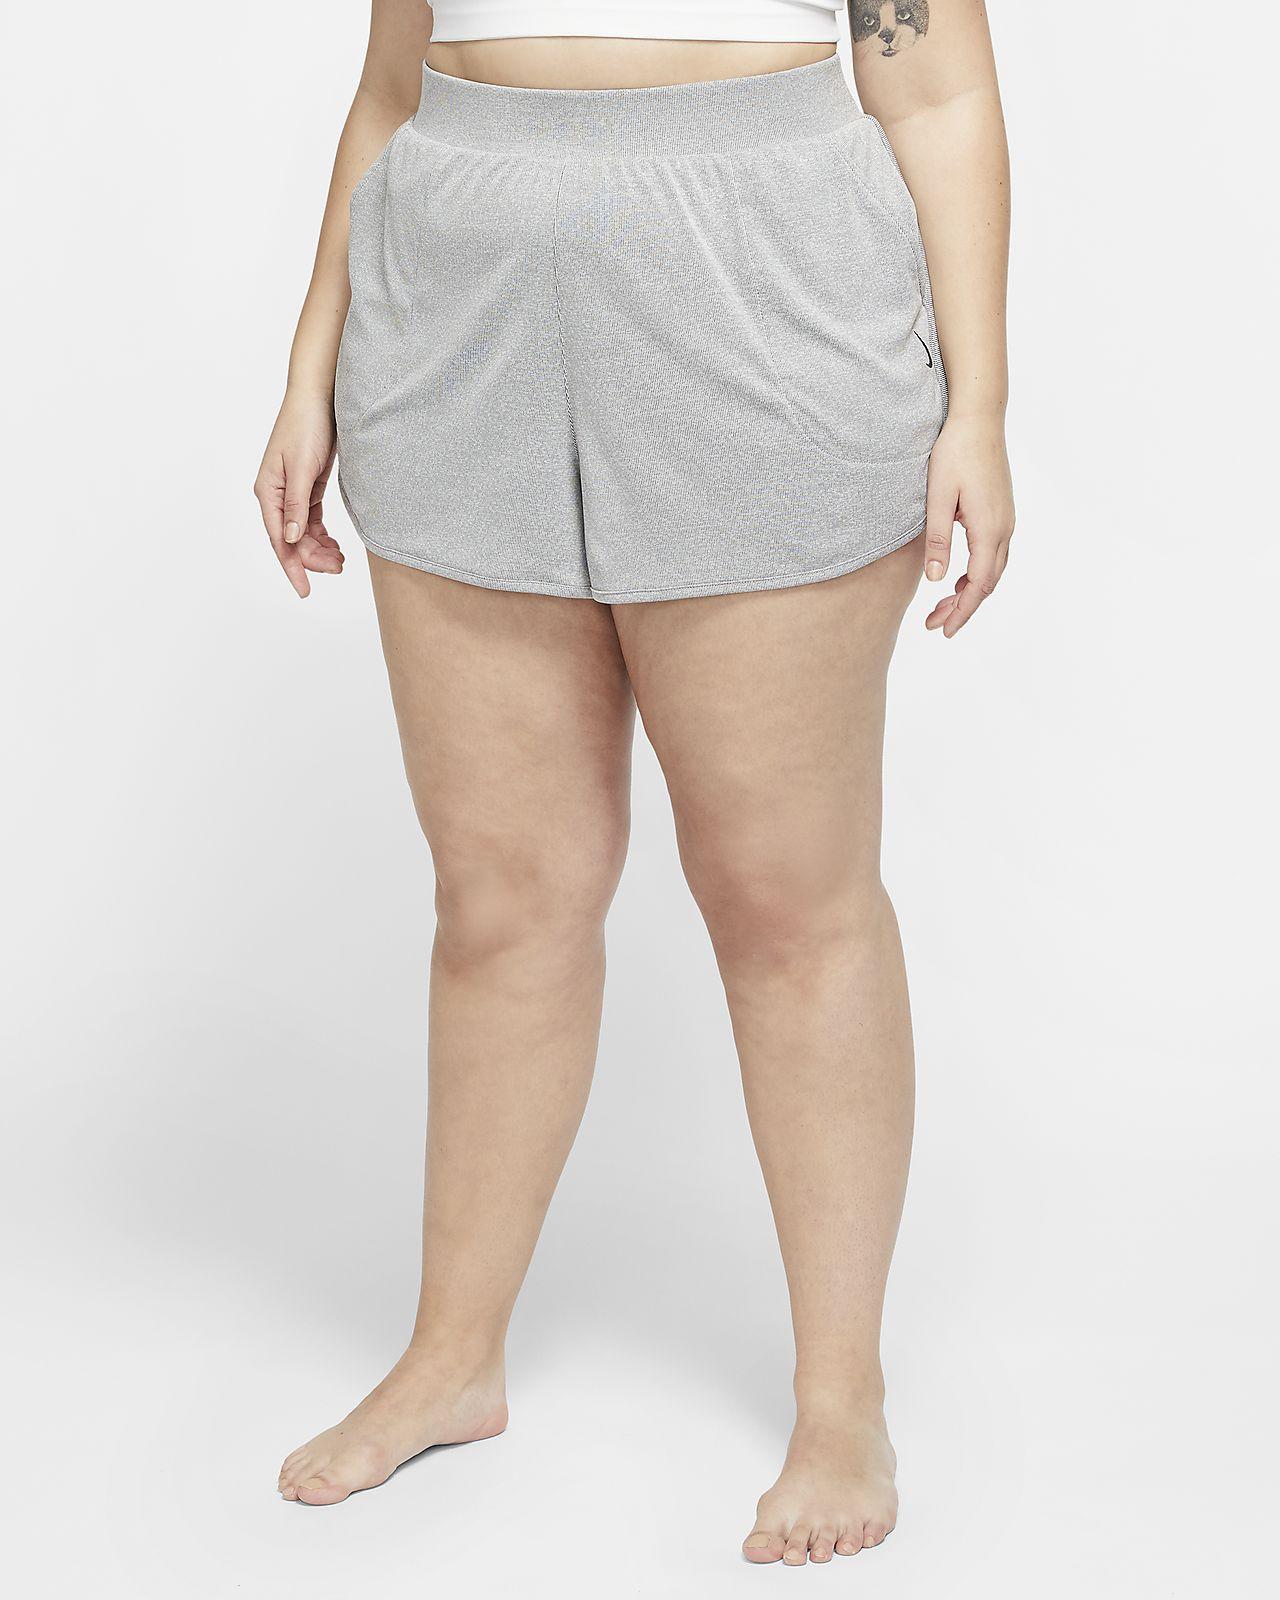 Nike Yoga Women's Shorts (Plus Size)